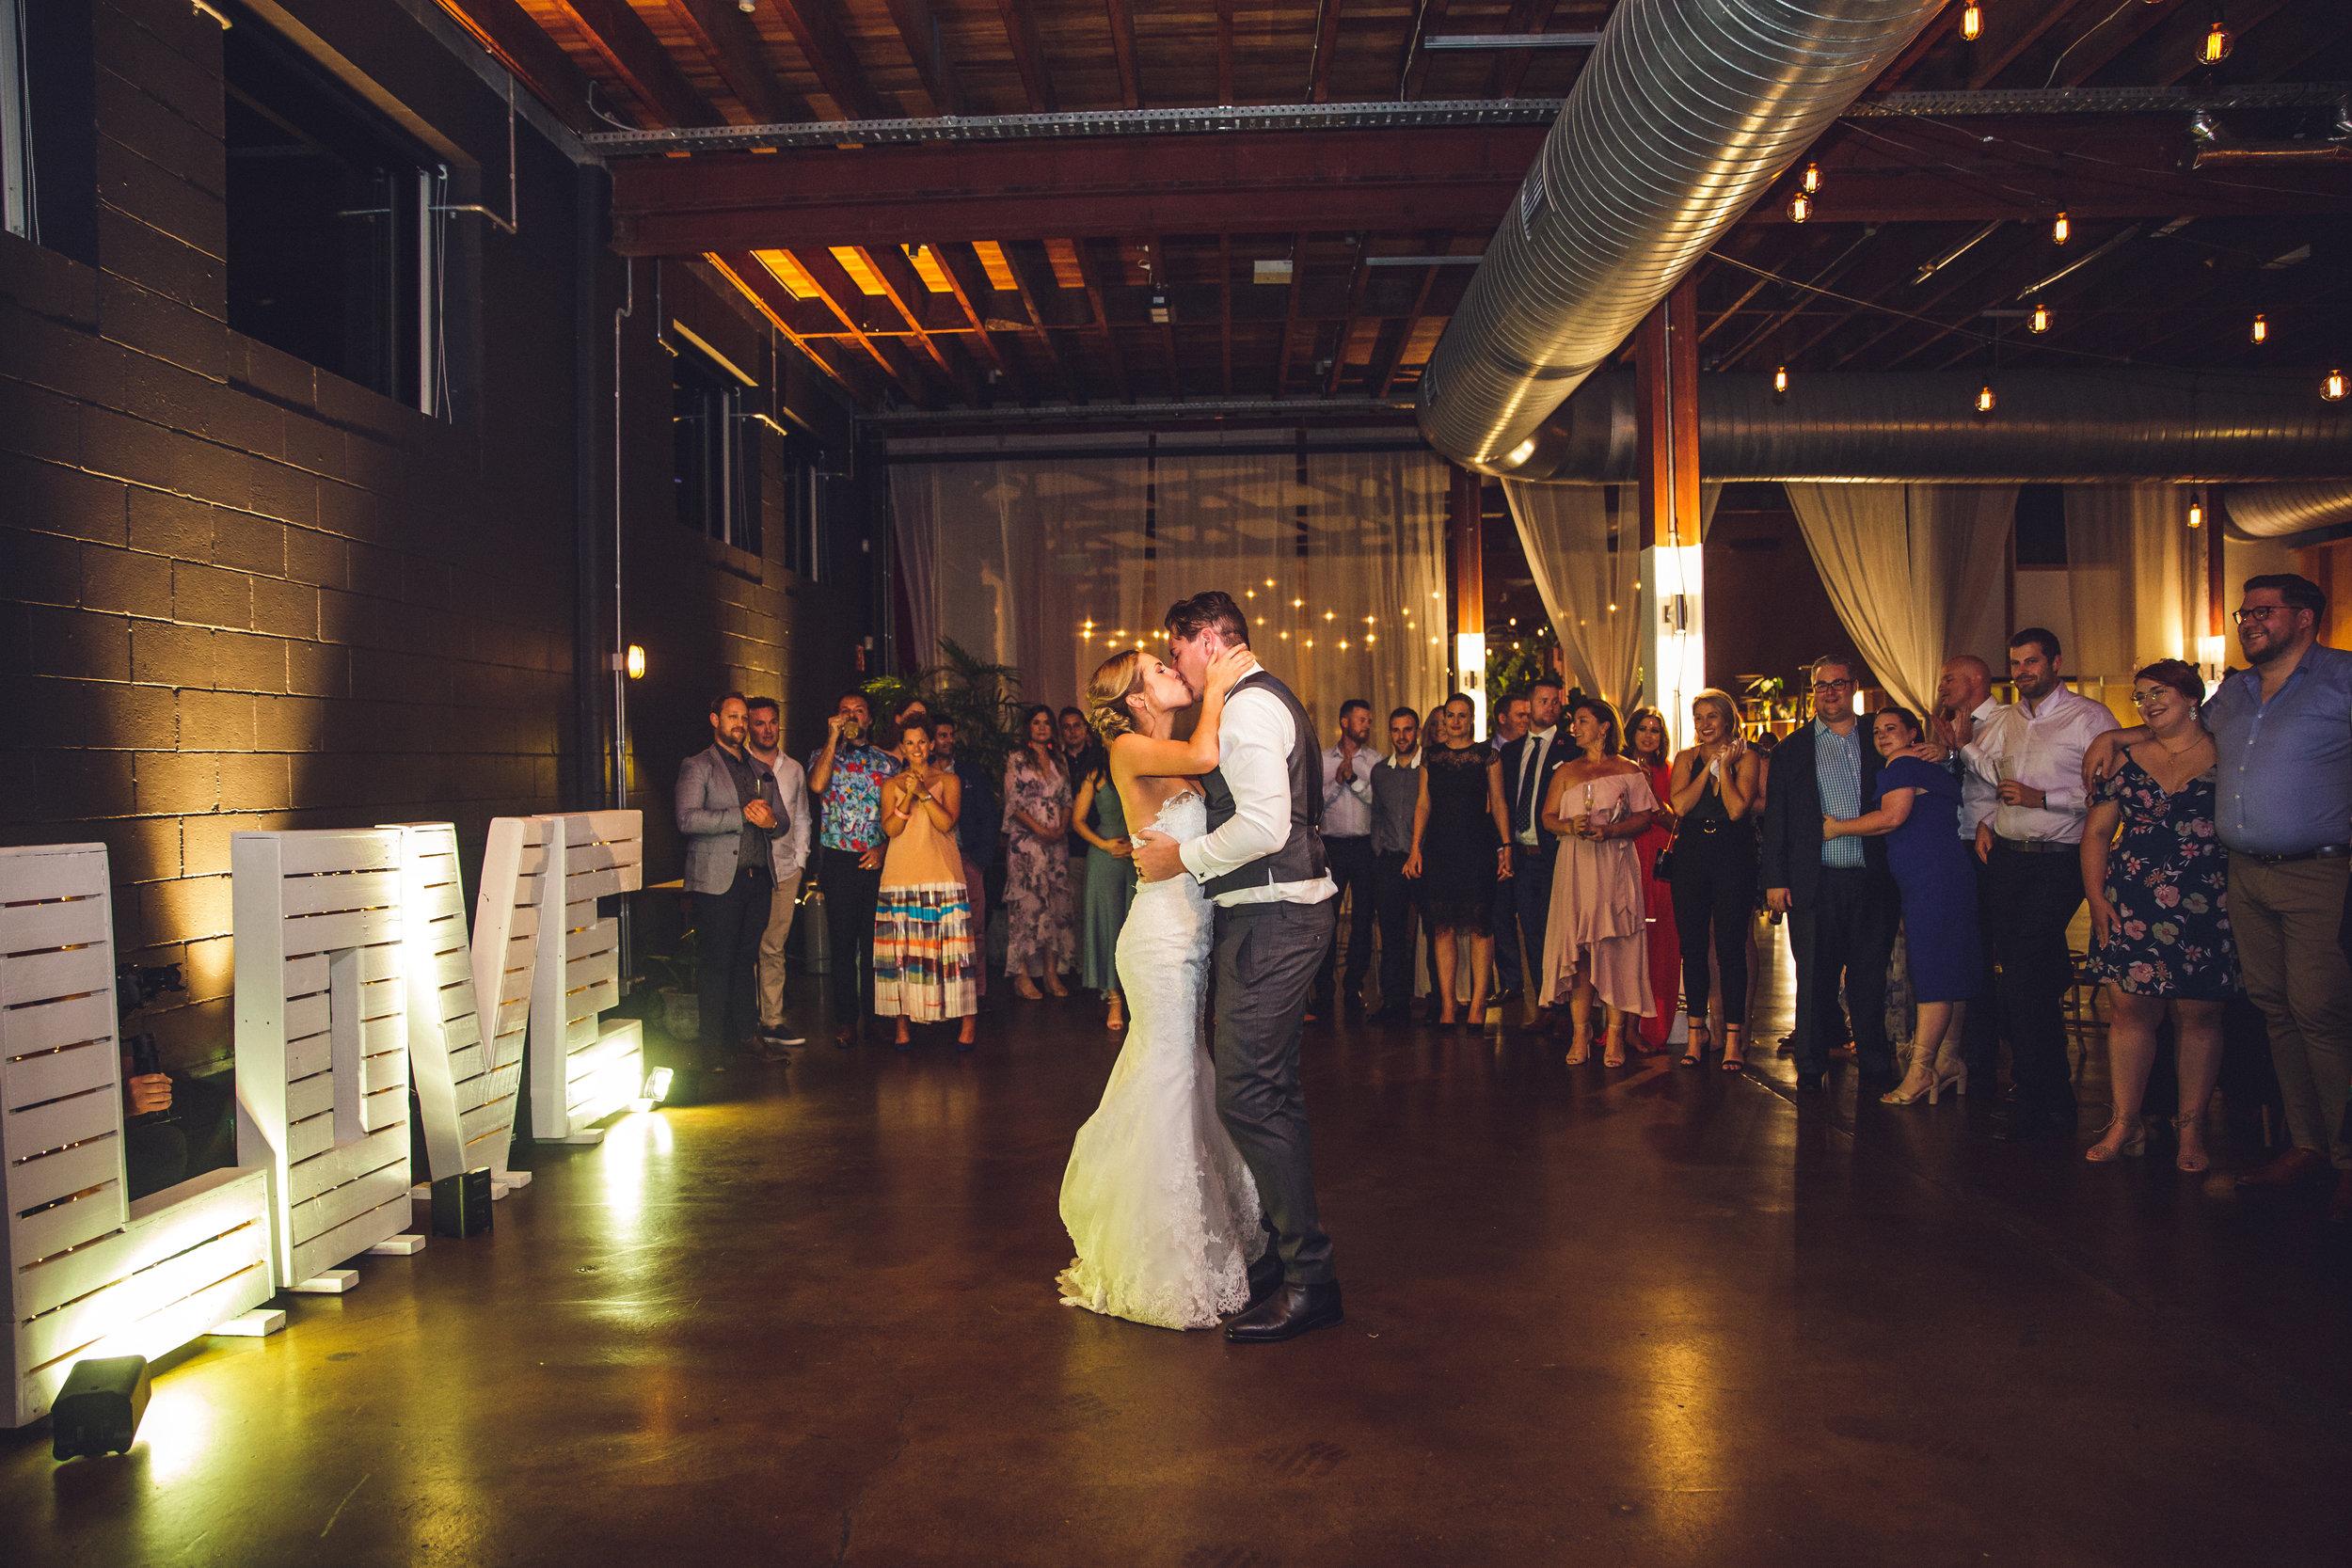 lightspace-brisbane-wedding-047.JPG